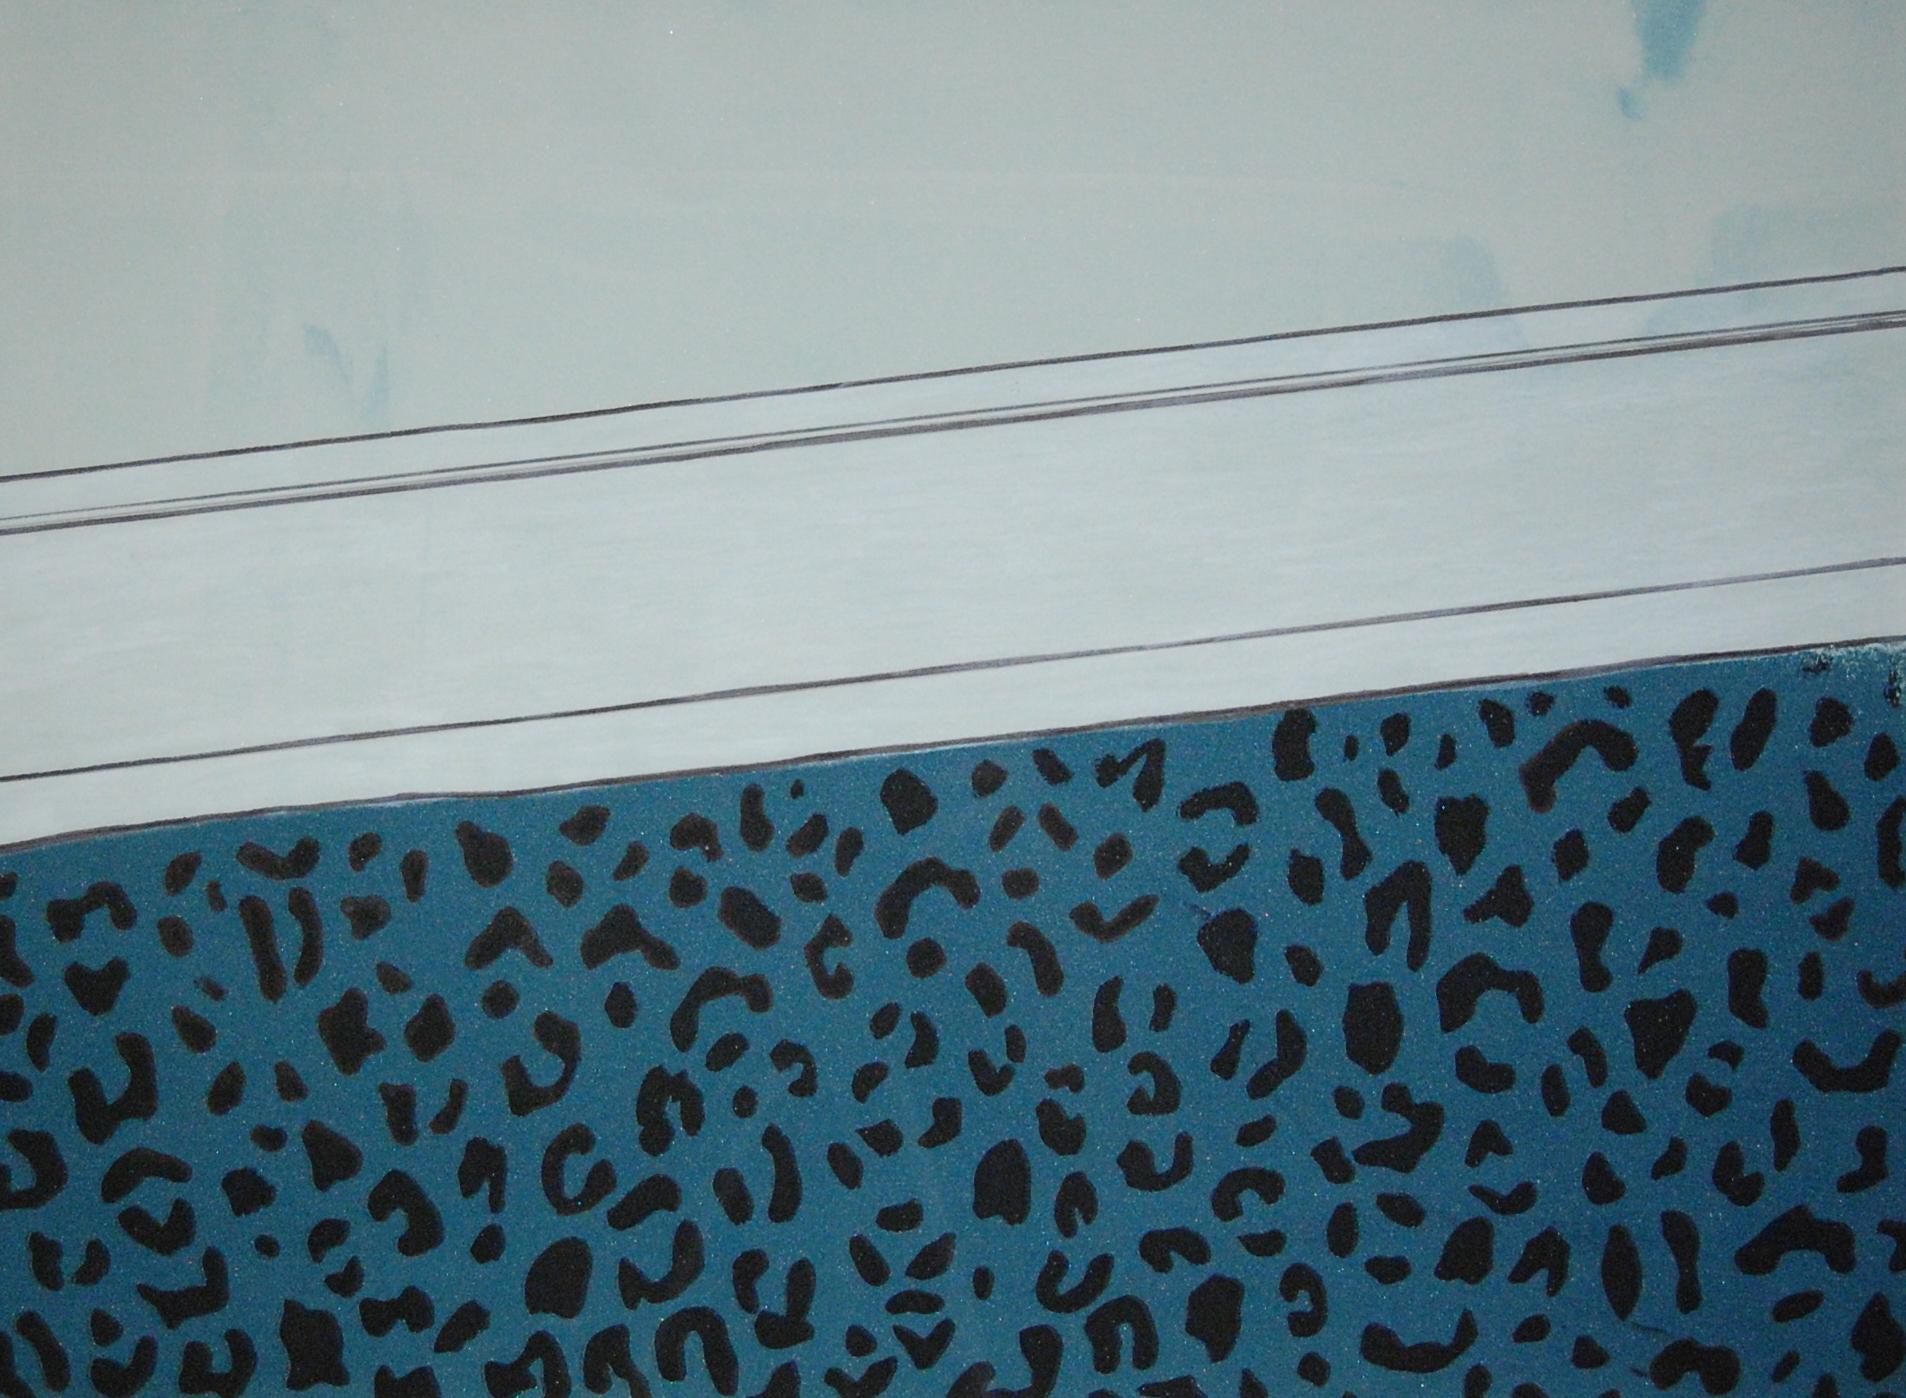 Leopard Carpet II